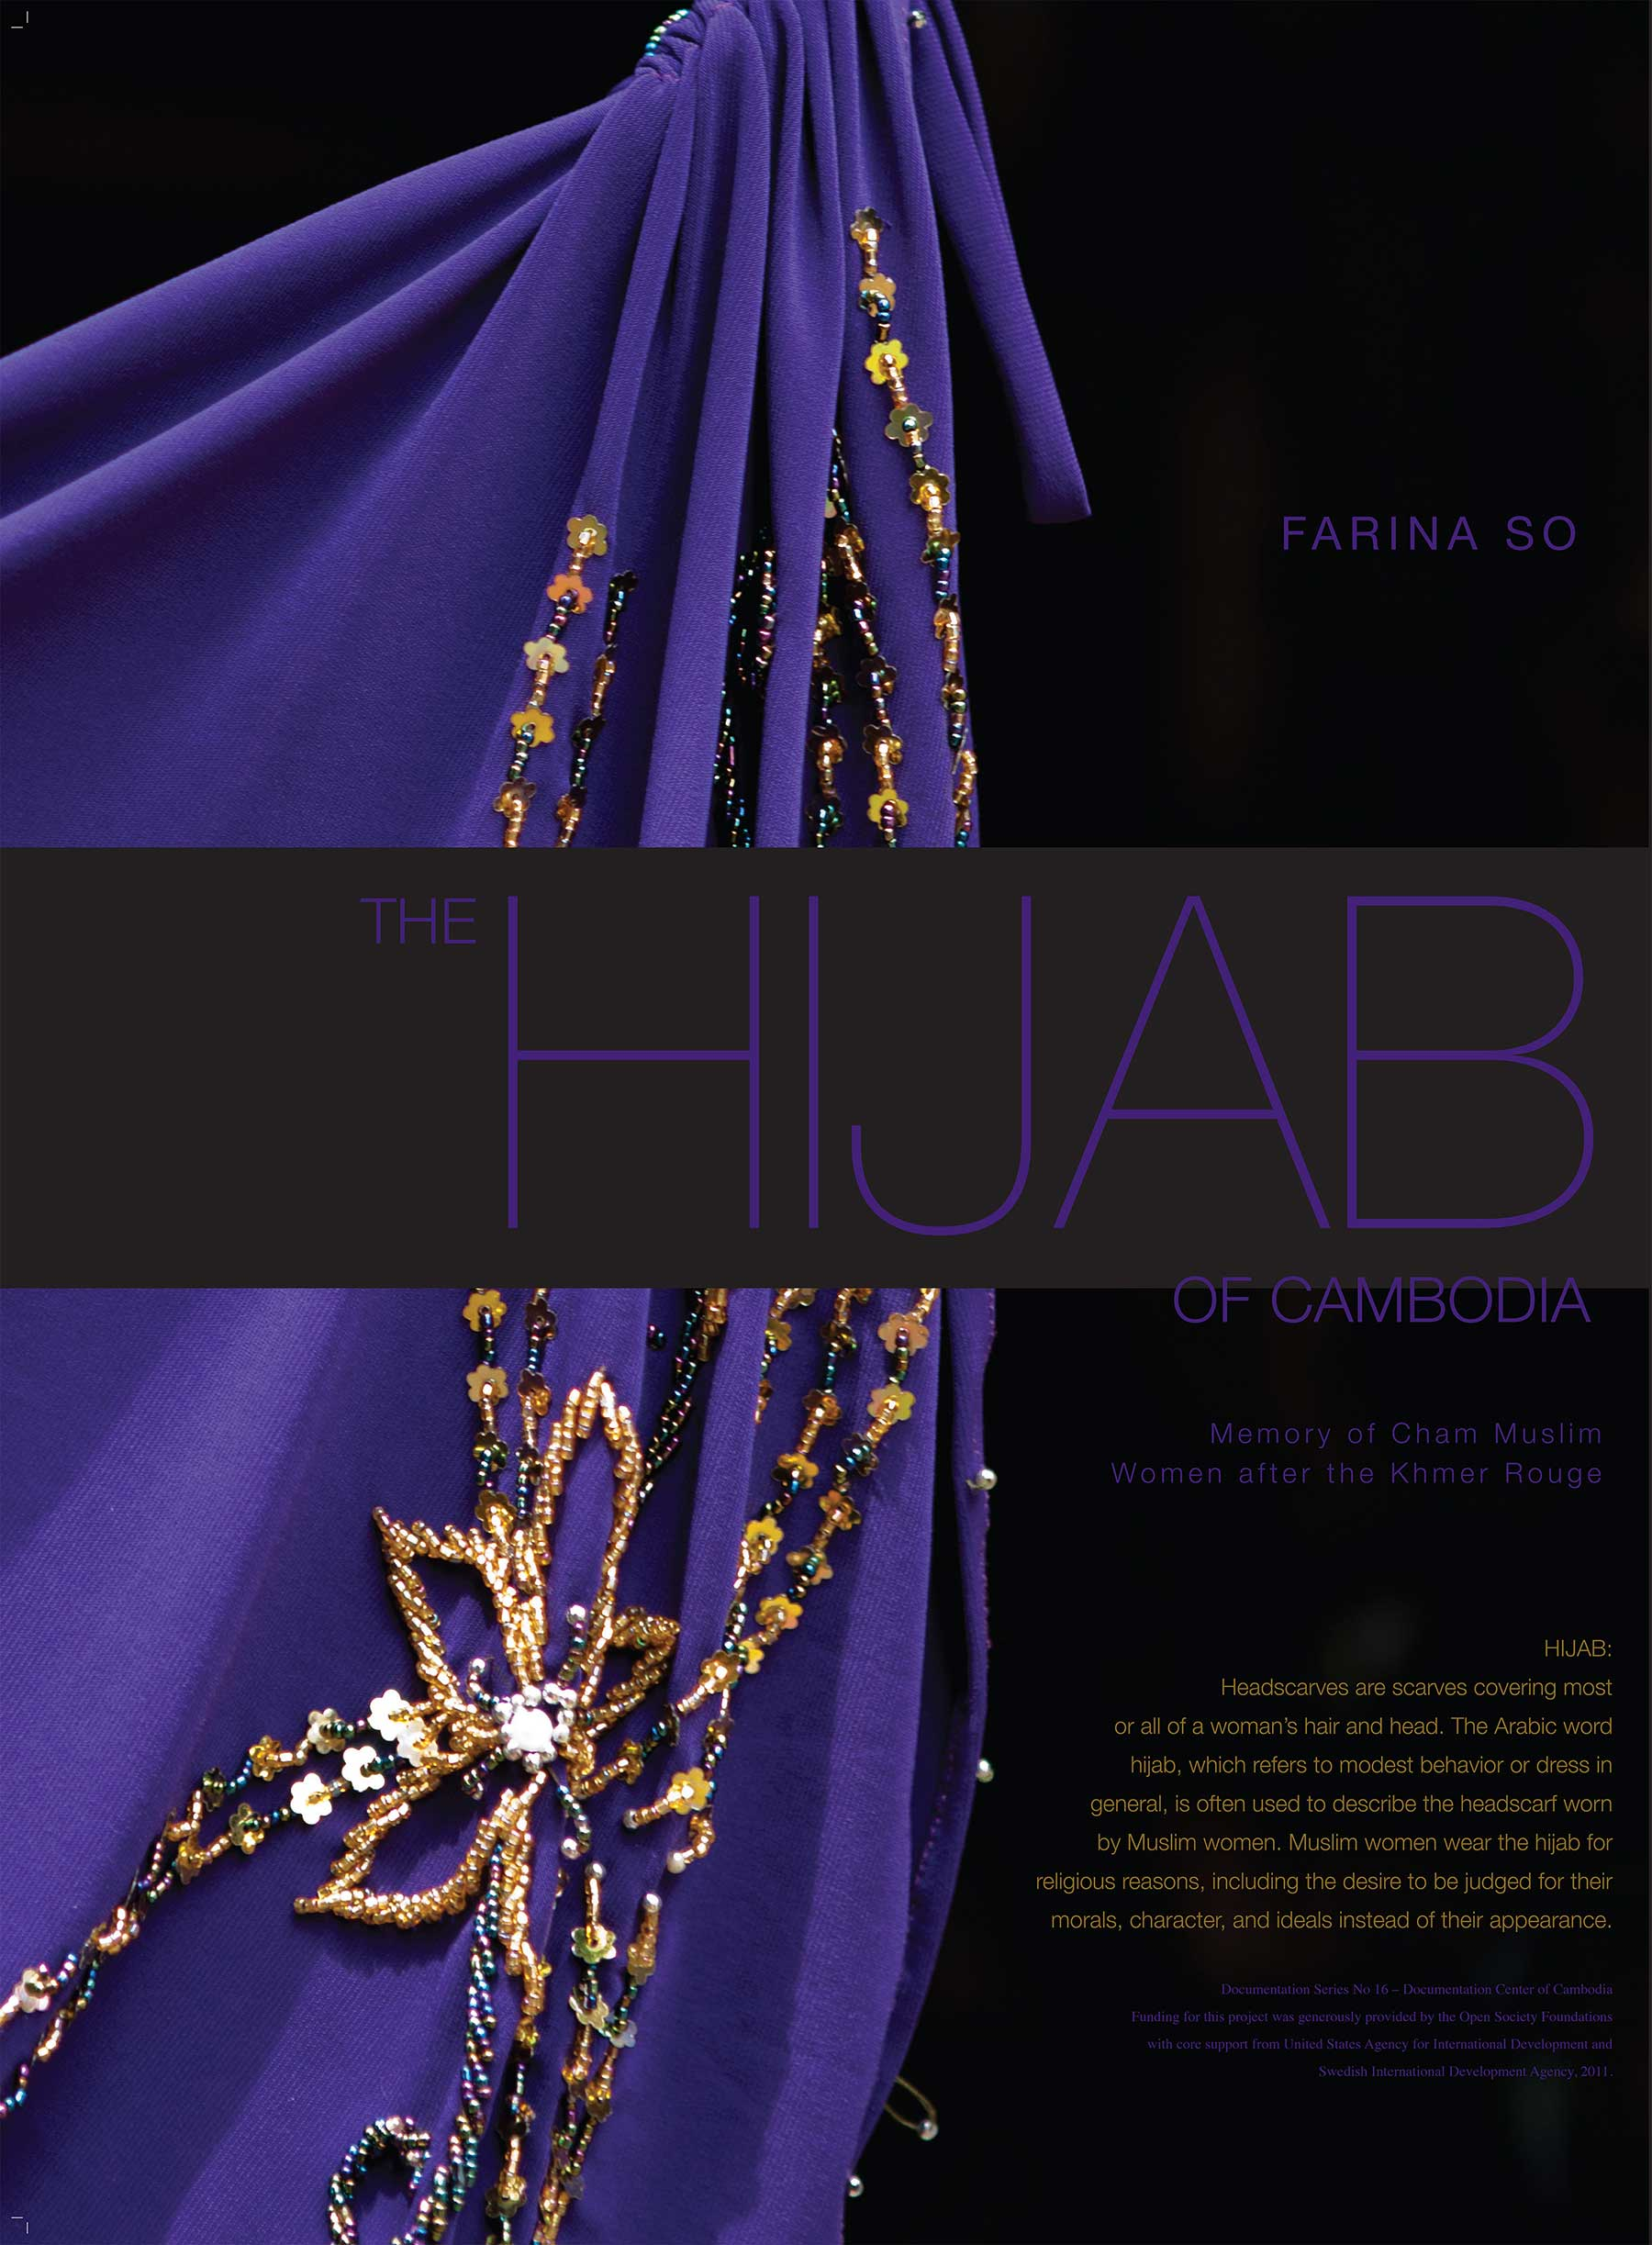 P_The-Hijab-of-Cambodia